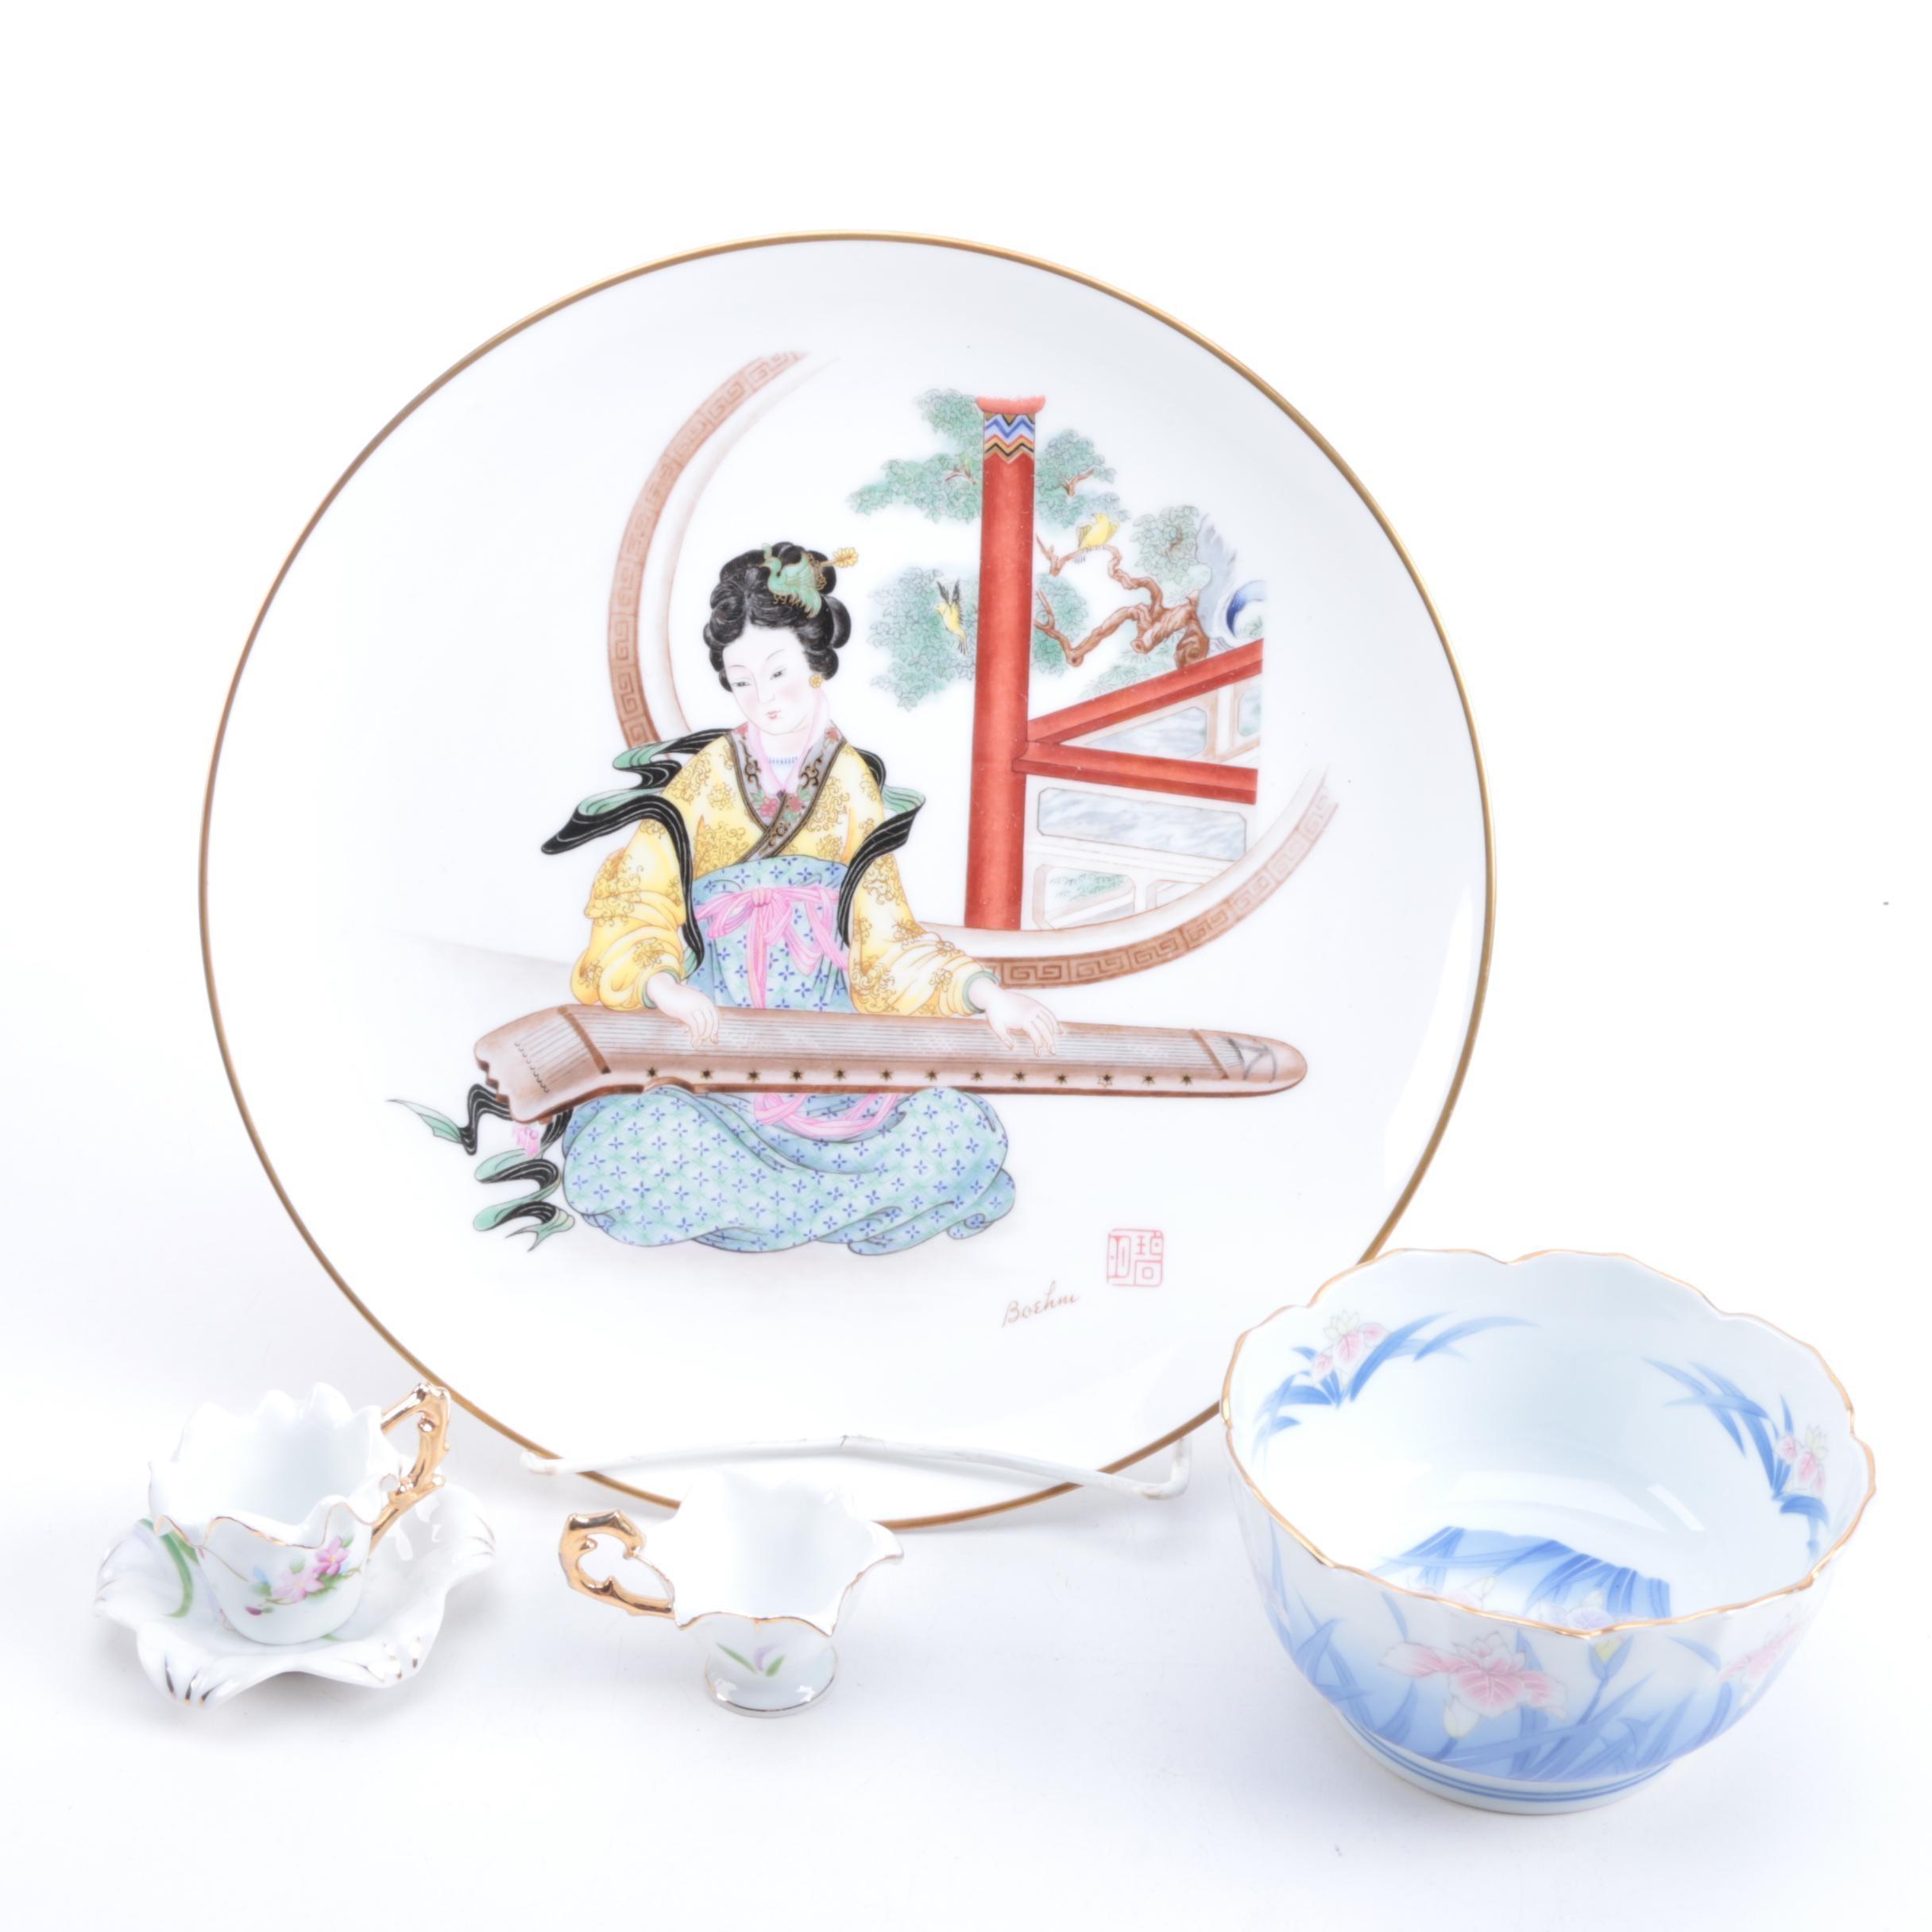 East Asian Porcelain Decor